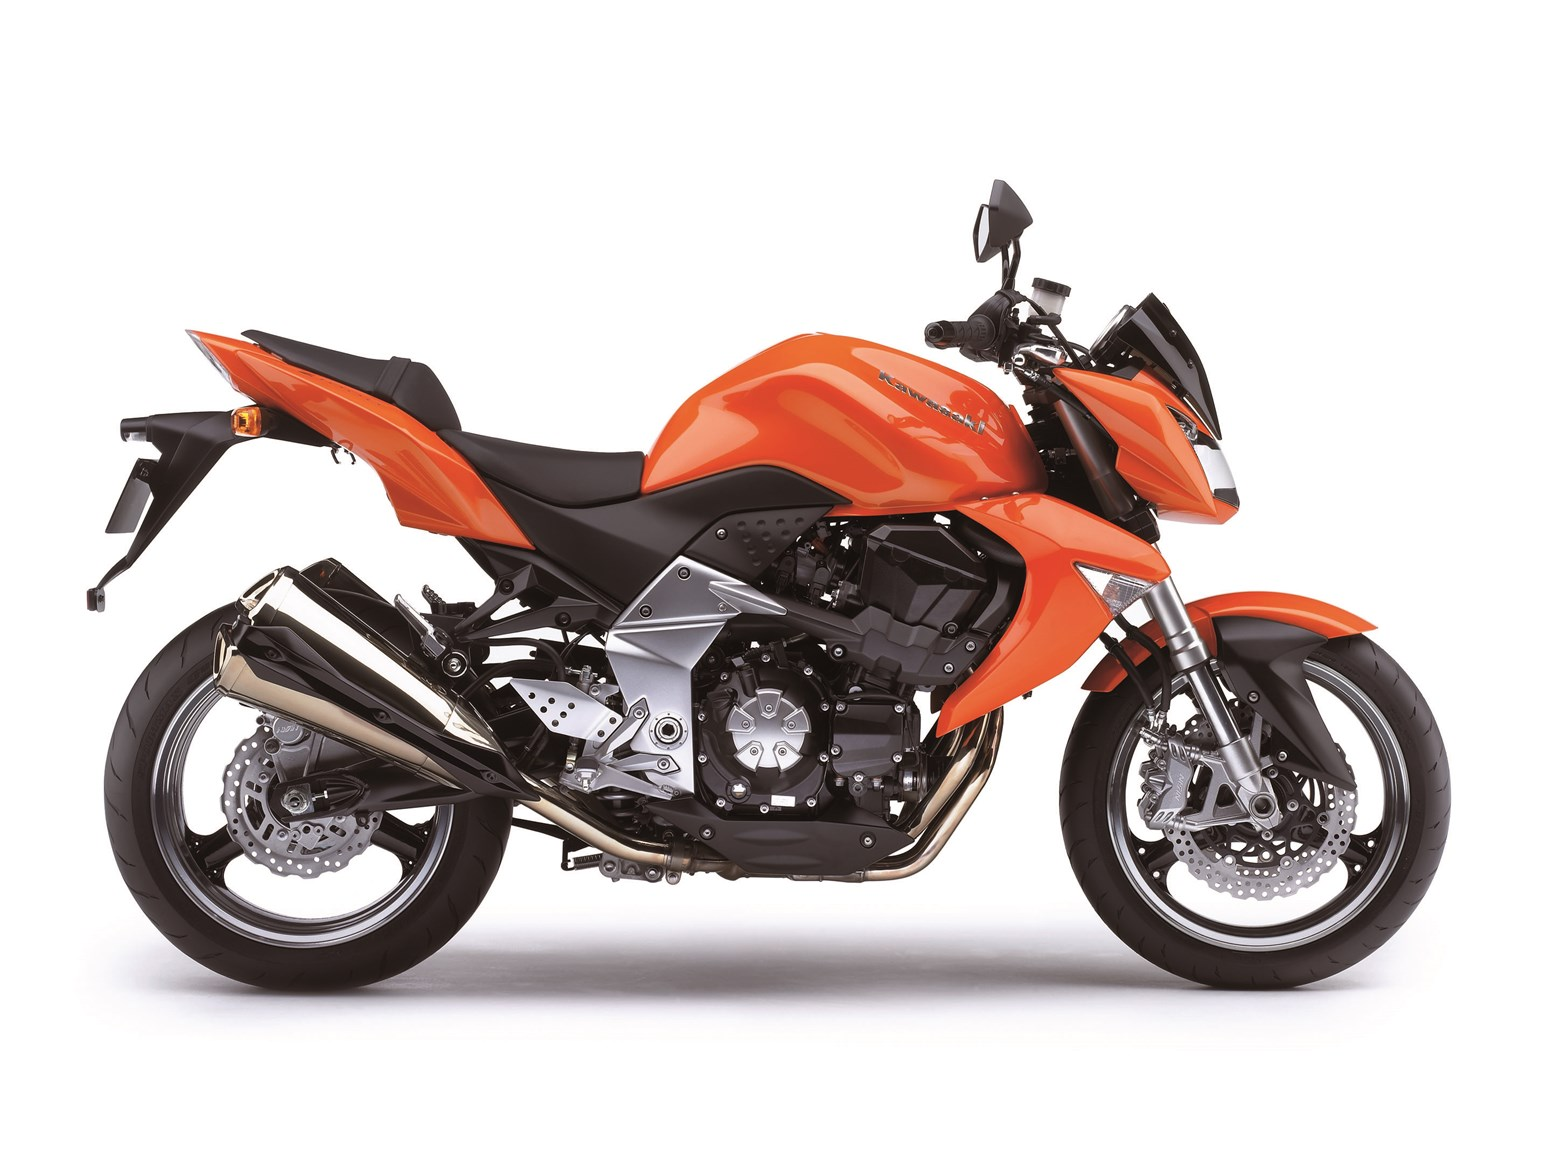 Z 1000 (2007-2009)